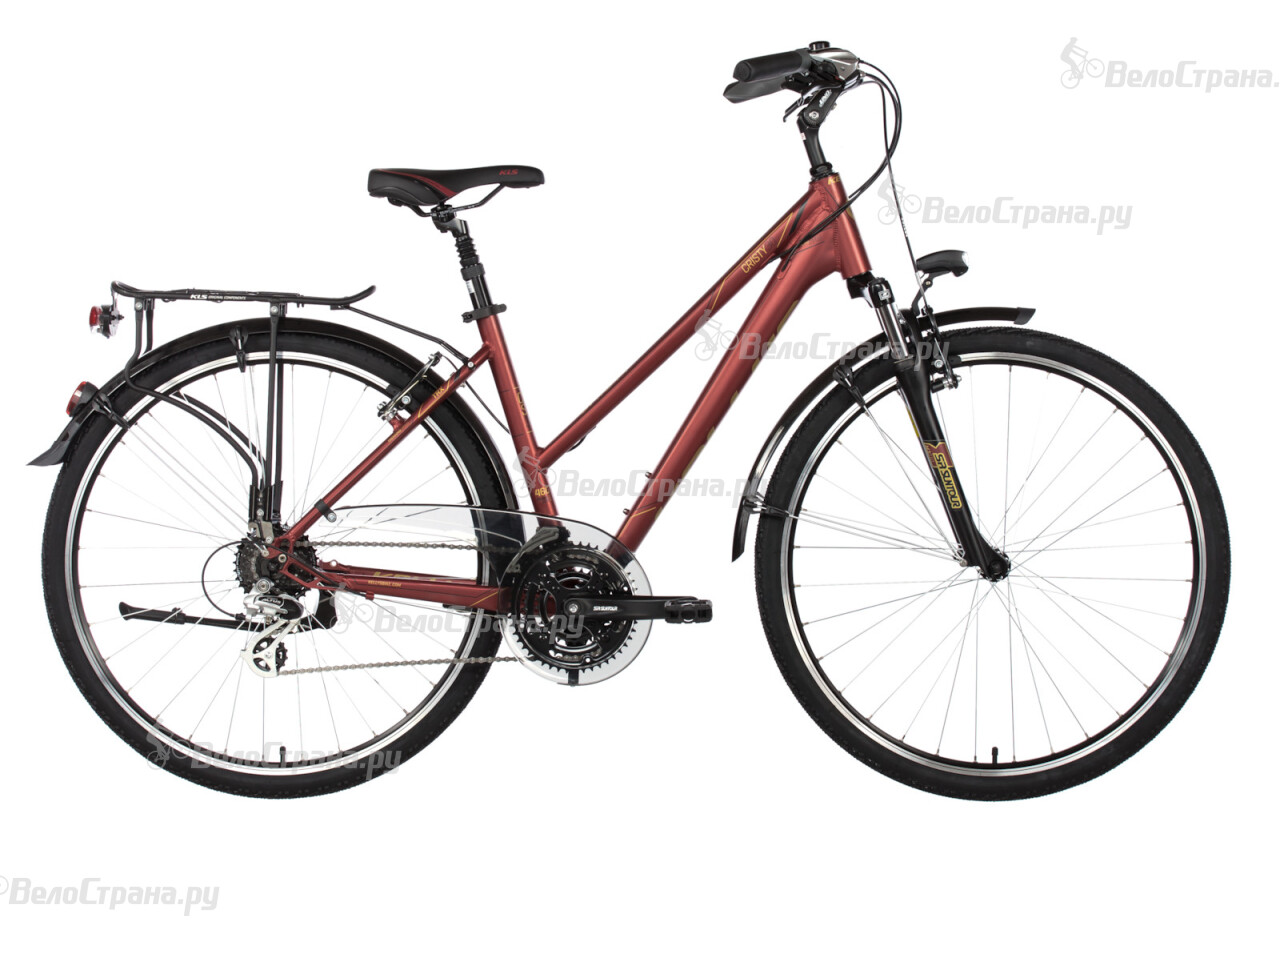 Велосипед Kellys CRISTY 30 (2017) велосипед kellys swag 30 2017